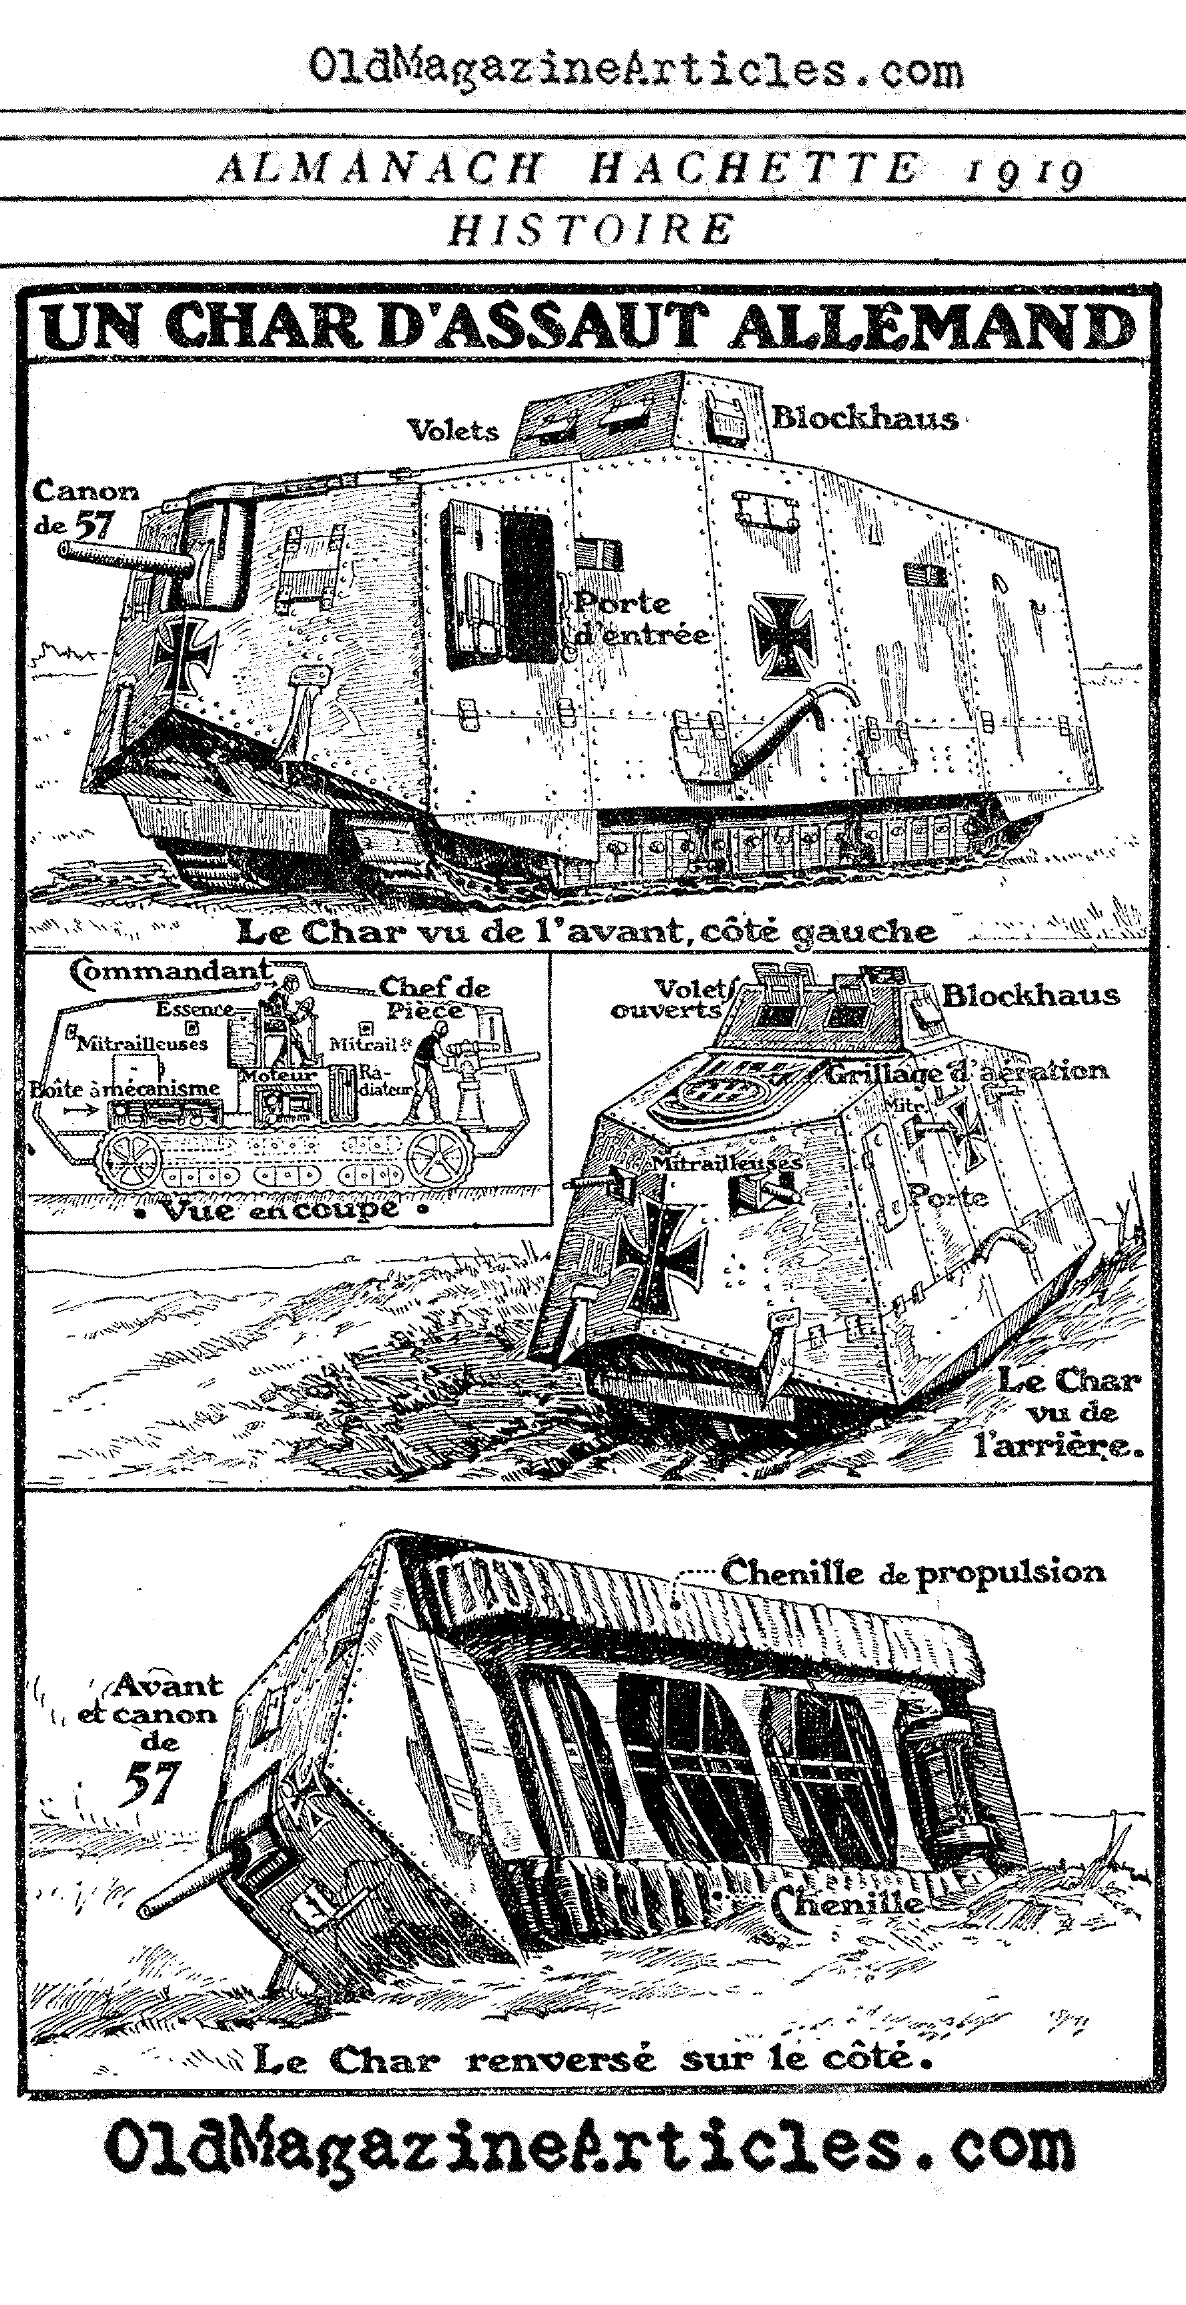 ww1 trench system diagram wiring 2 pin flasher unit german a7v tank 1918 armor